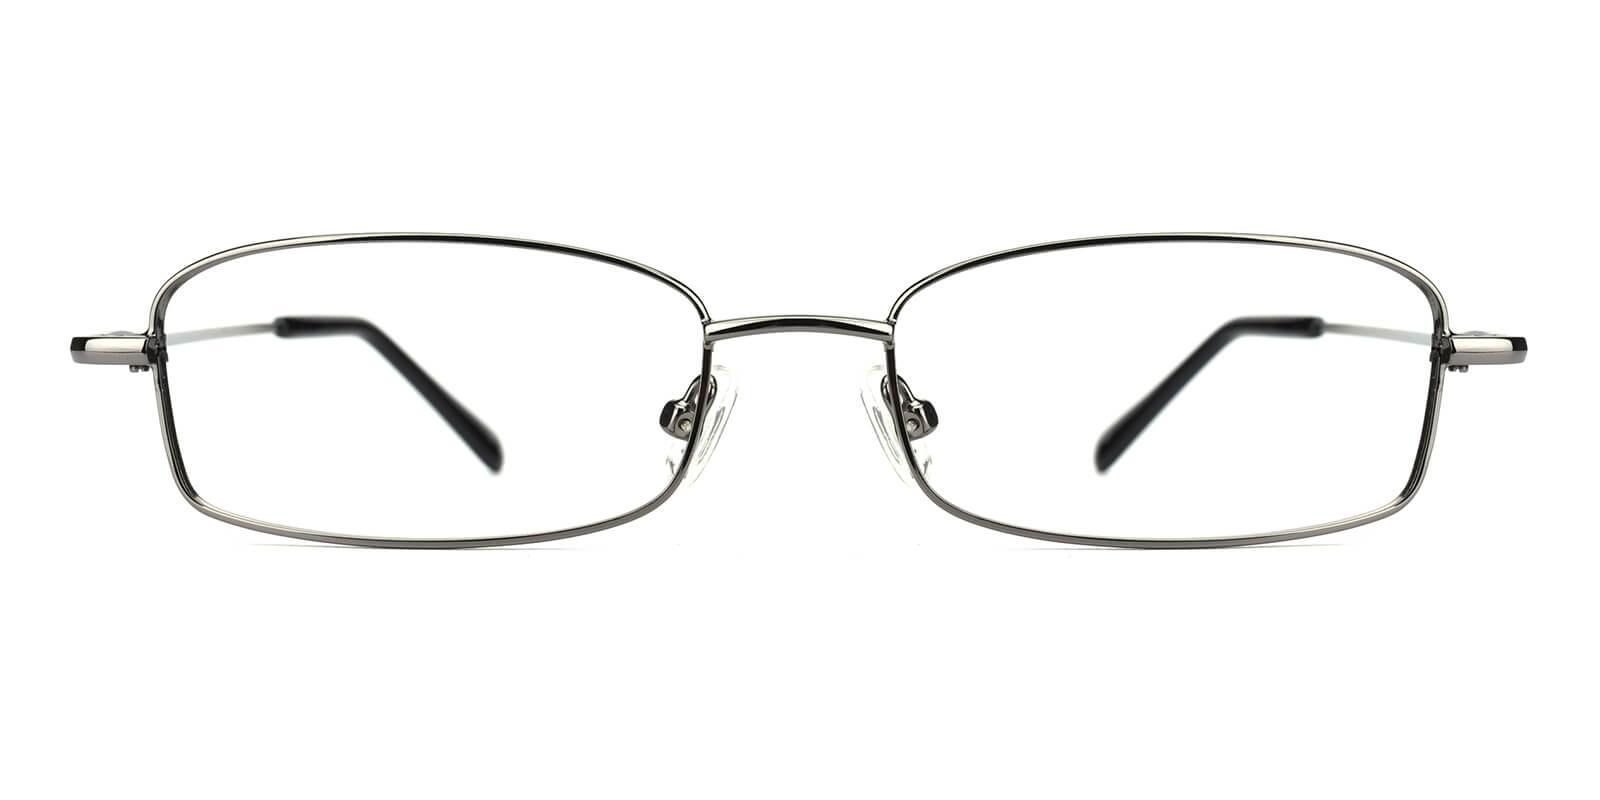 Isha-Gun-Rectangle-Metal-Eyeglasses-additional2